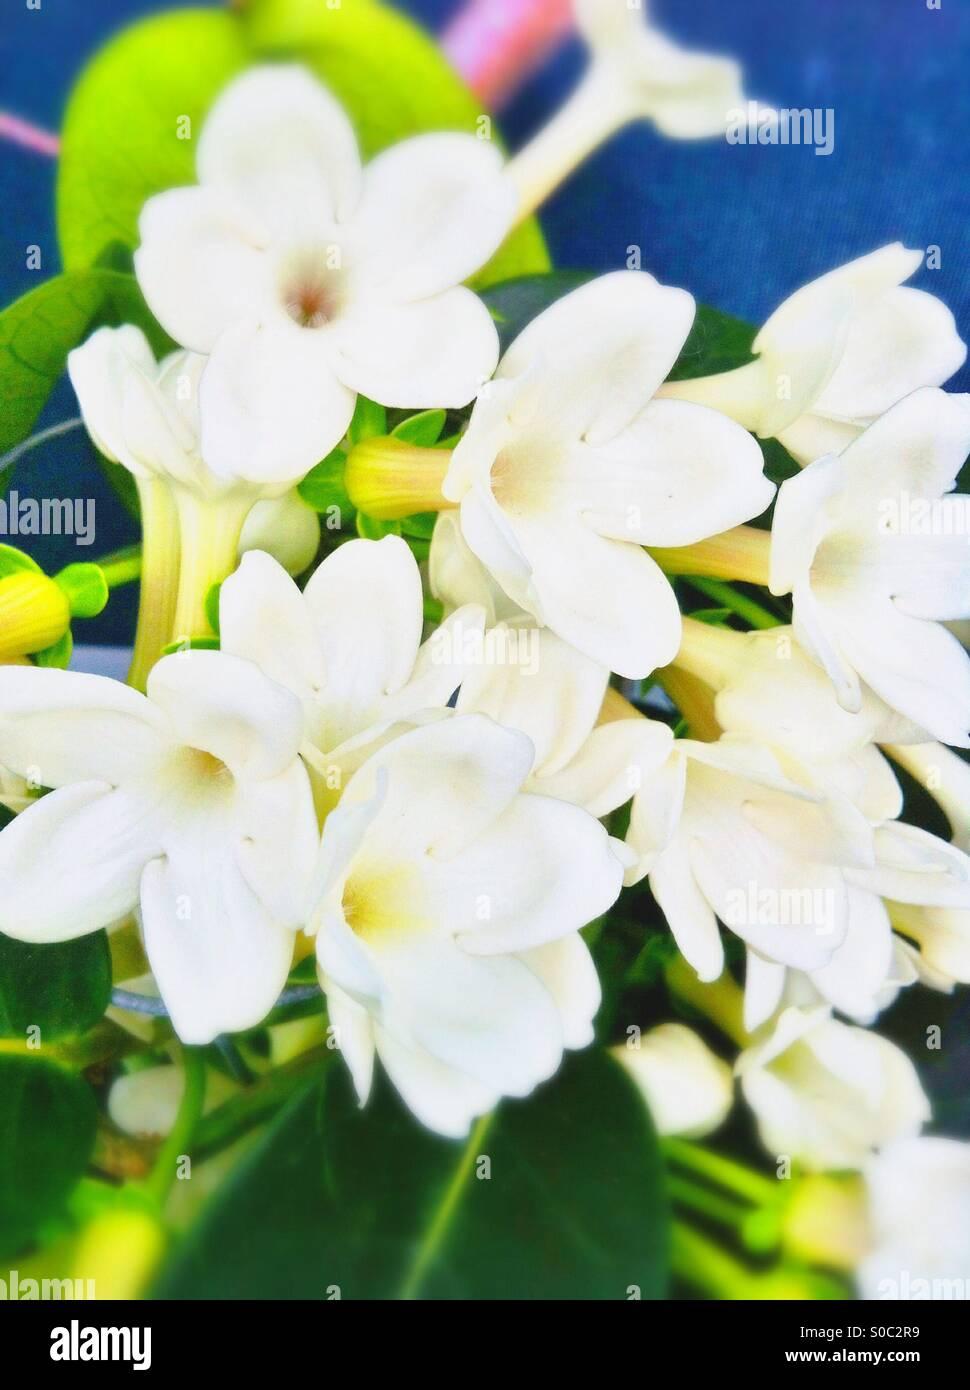 White jasmine stock photos white jasmine stock images alamy white jasmine flowers stock image izmirmasajfo